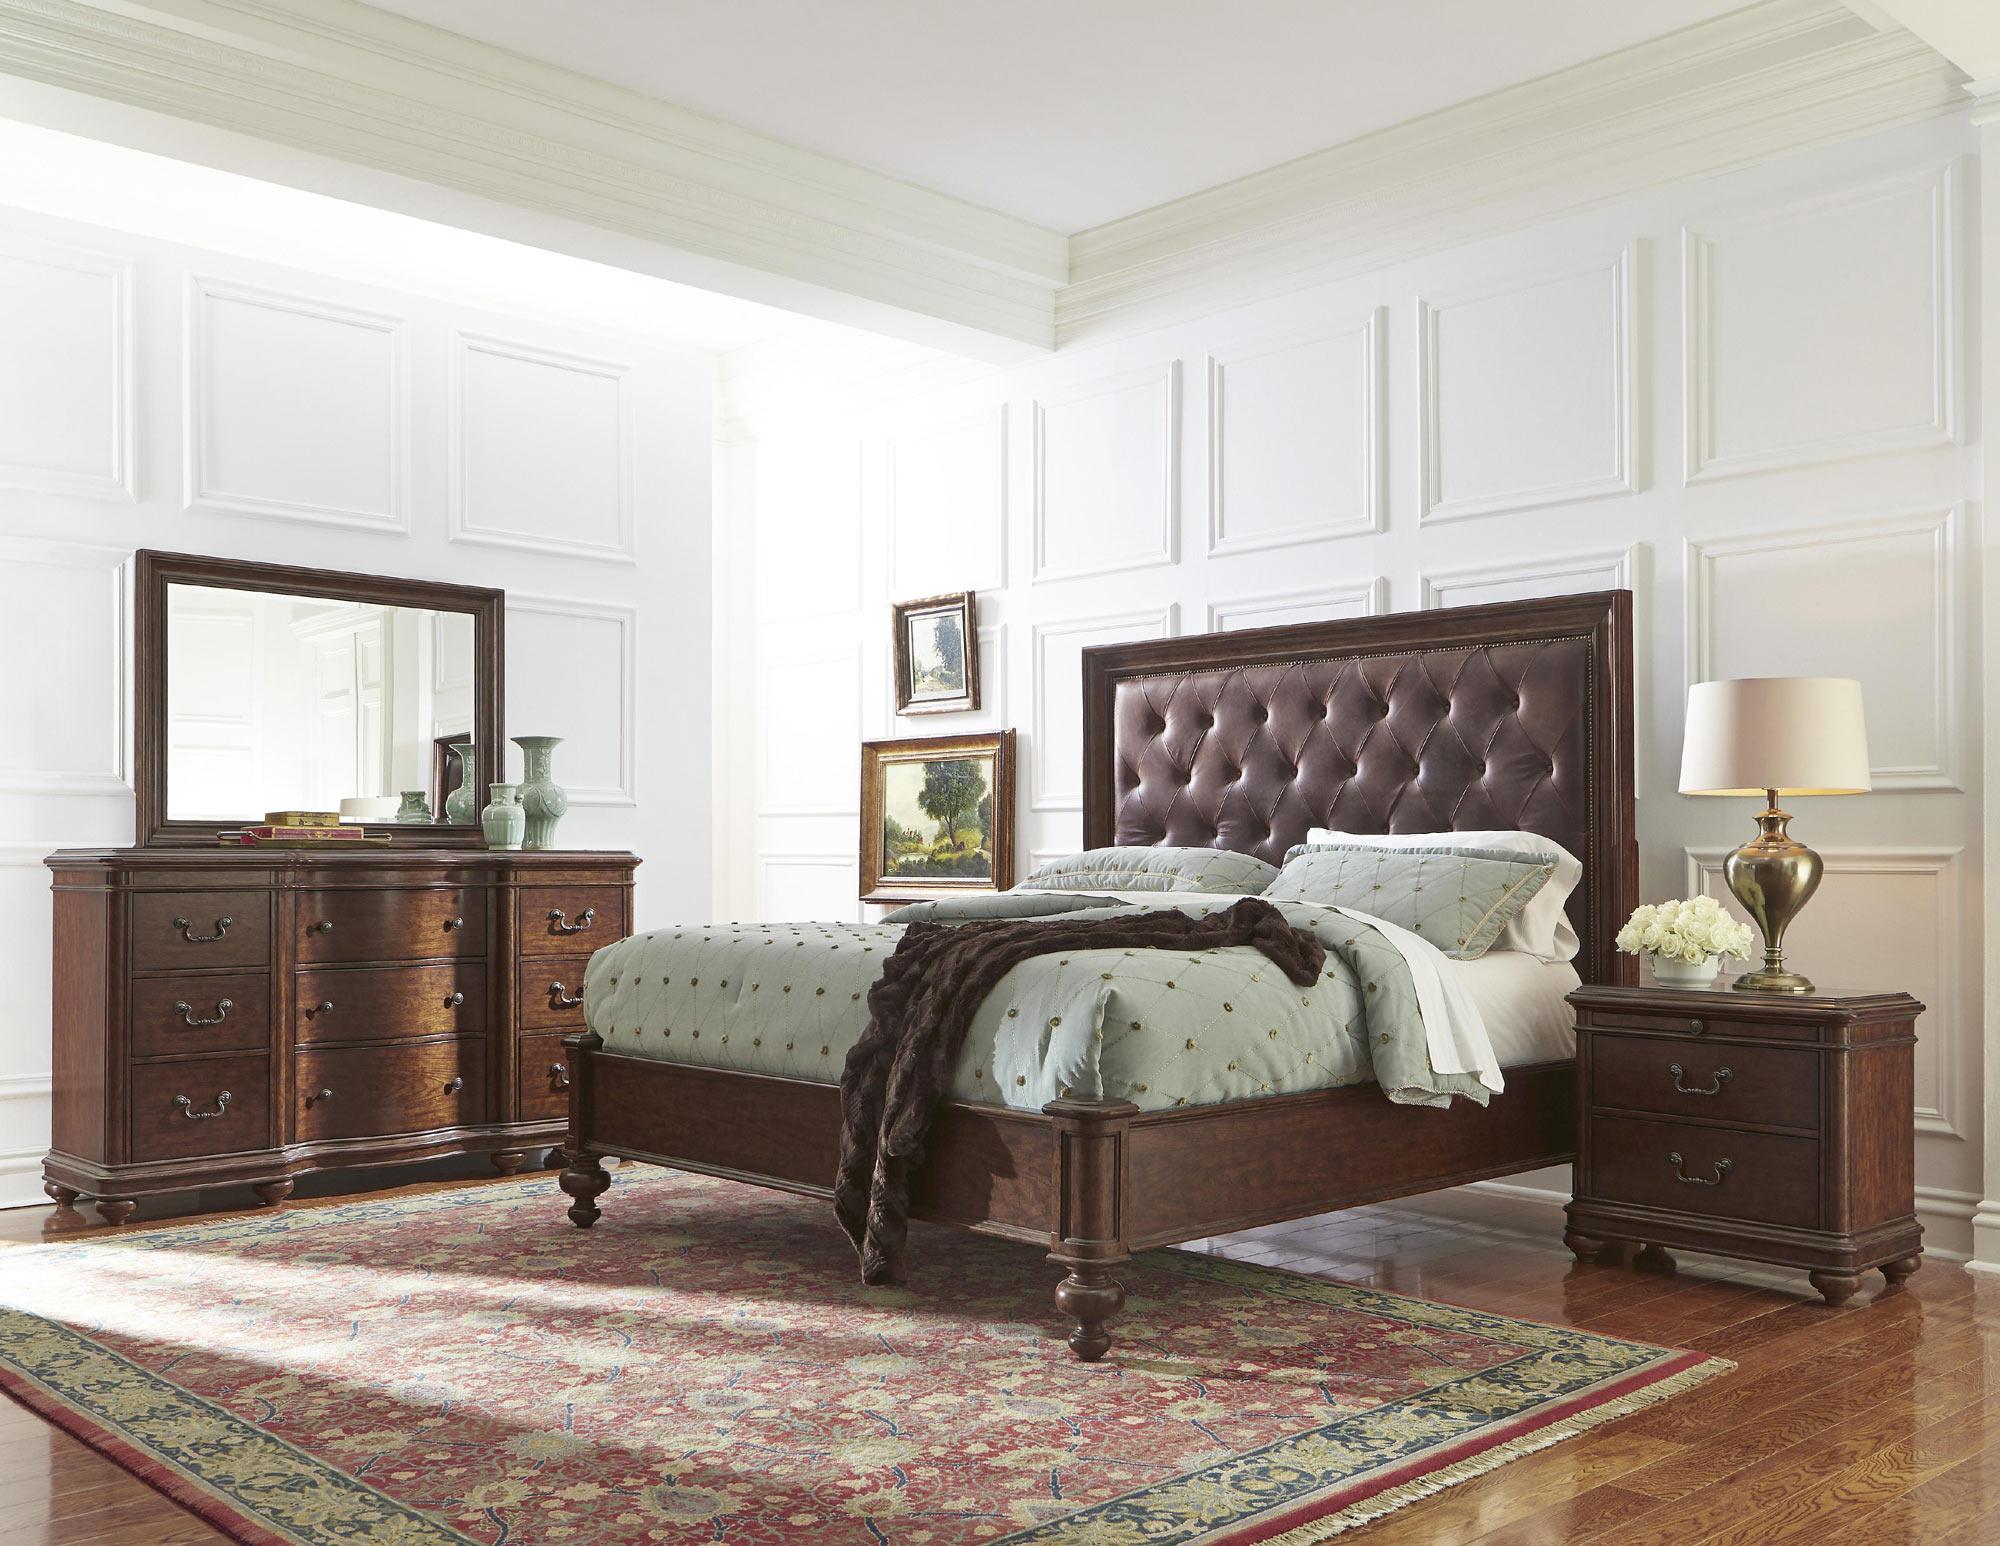 California King Platform Bed | Pulaski | Home Gallery Stores ...